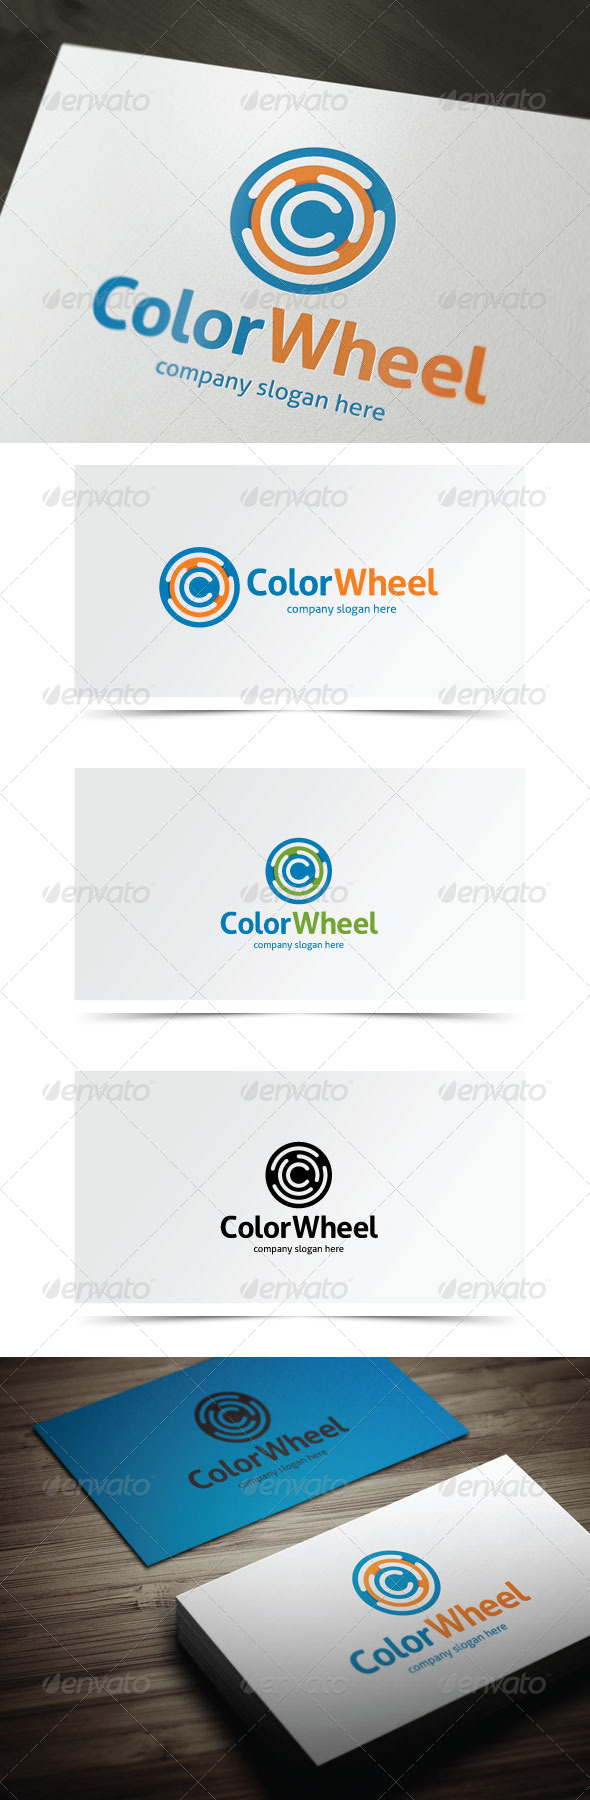 Color Wheel - Letters Logo Templates